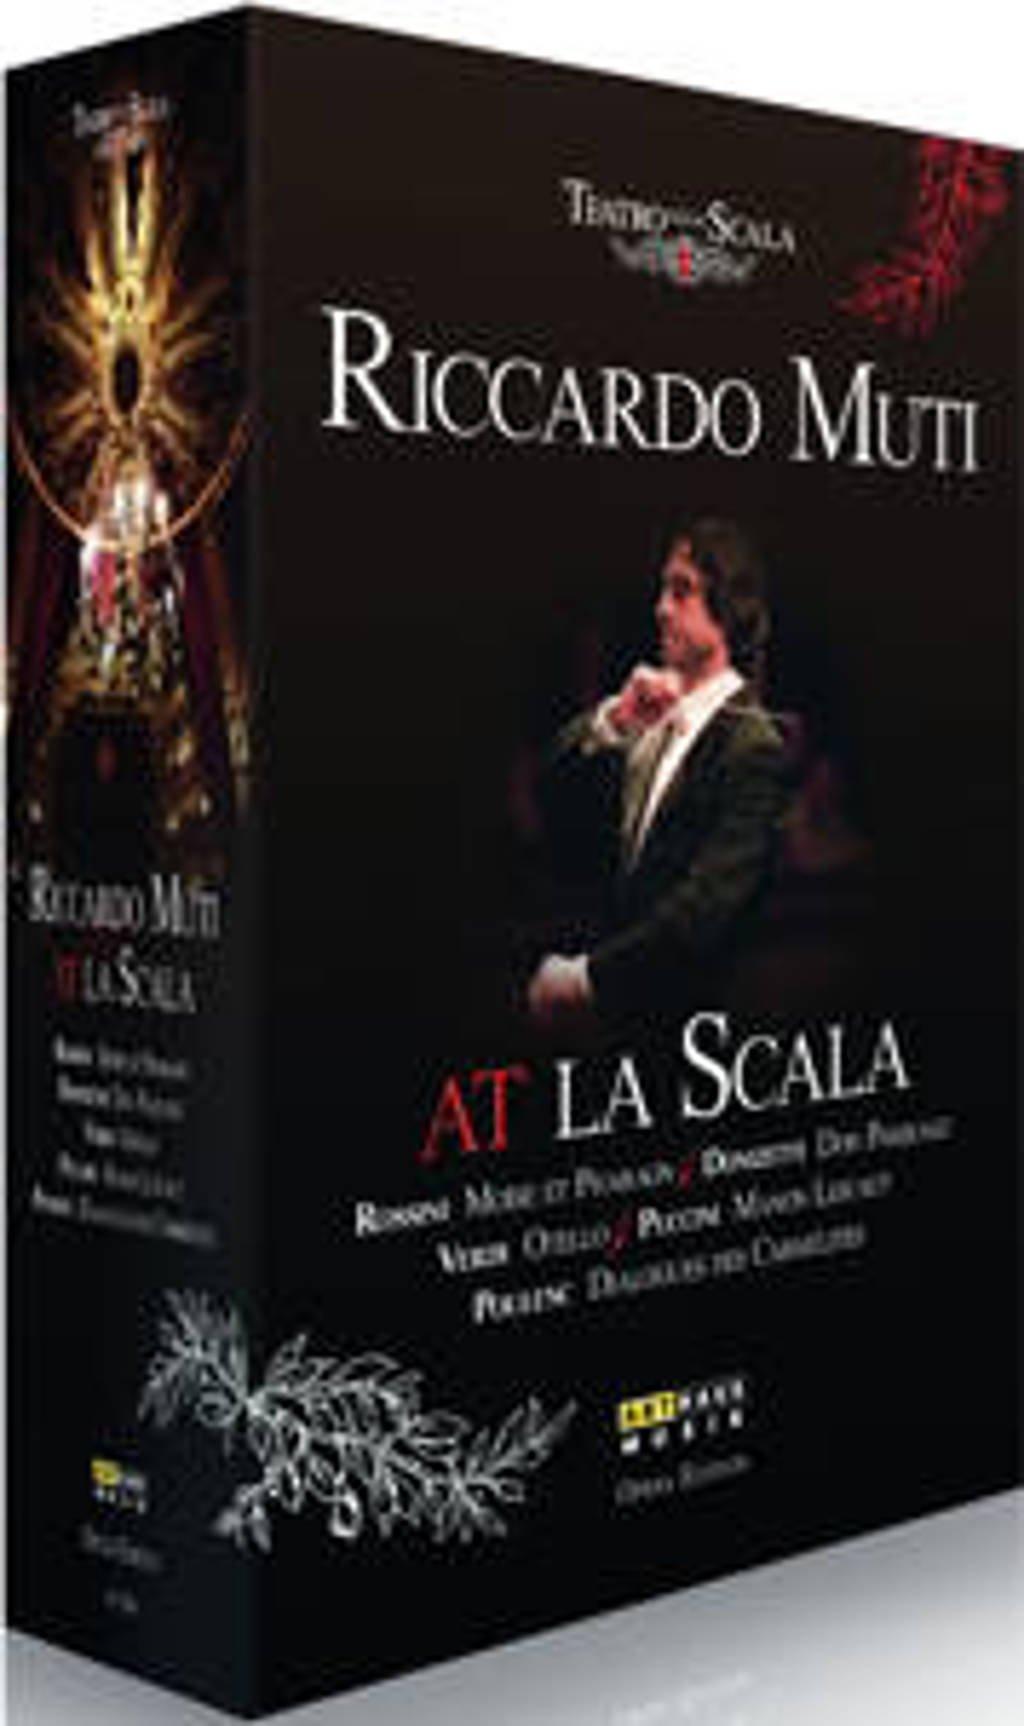 Joach Friedrich Gulda; Limpe Fuchs - Riccardo Muti At La Scala 5 Opera's (DVD)